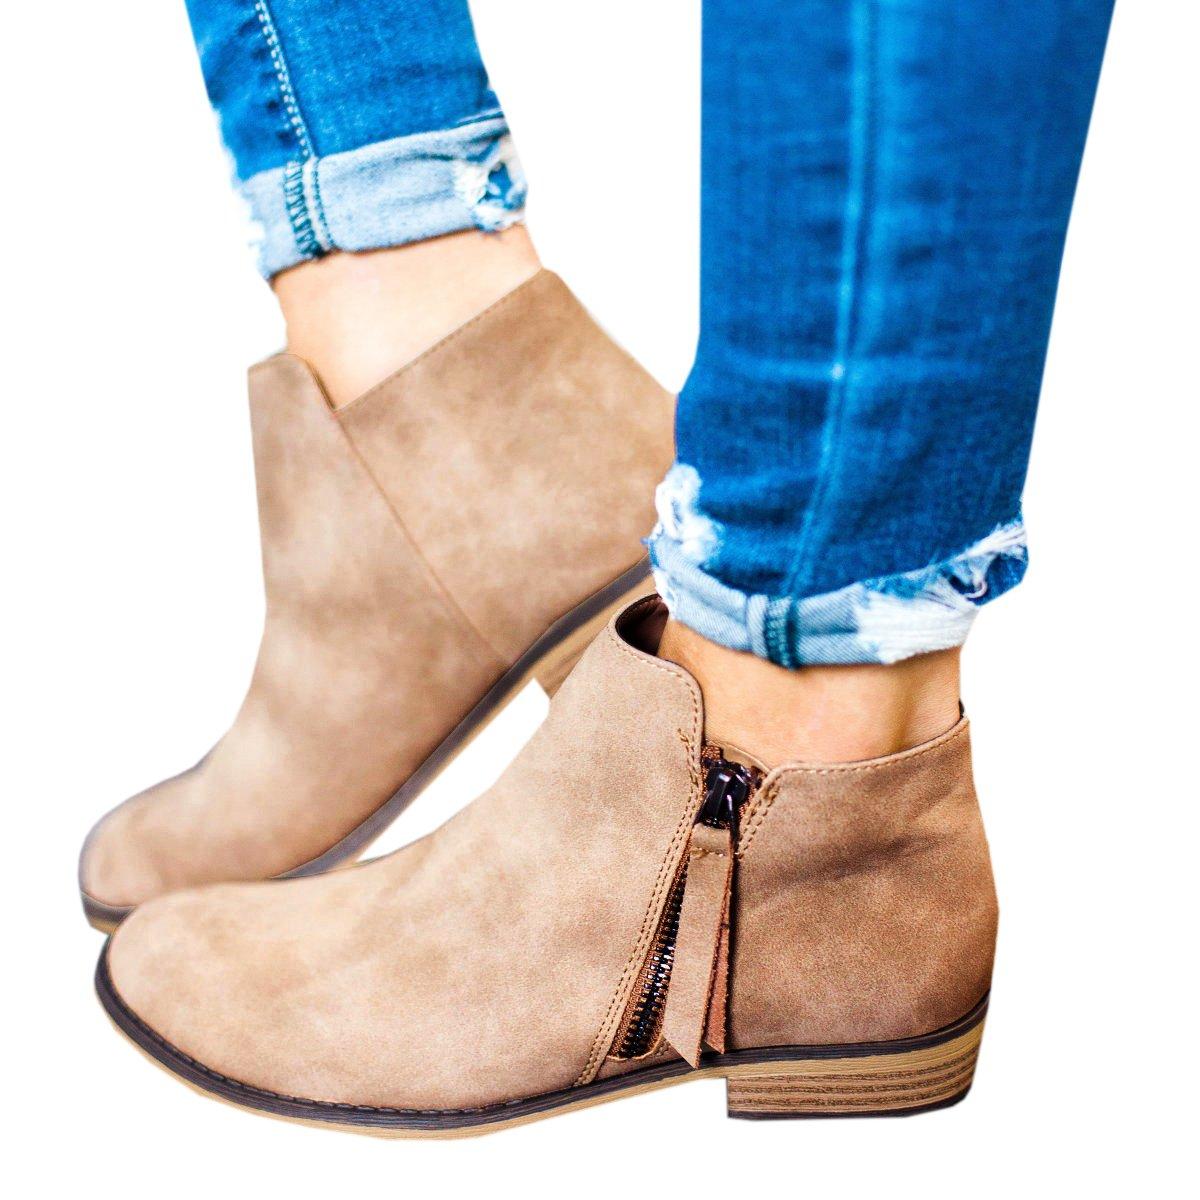 87ea7ee009 Chellysun Womens Ankle Boots Cusp Toe Low Heel Zipper Flat Winter Cowboy  Western Booties